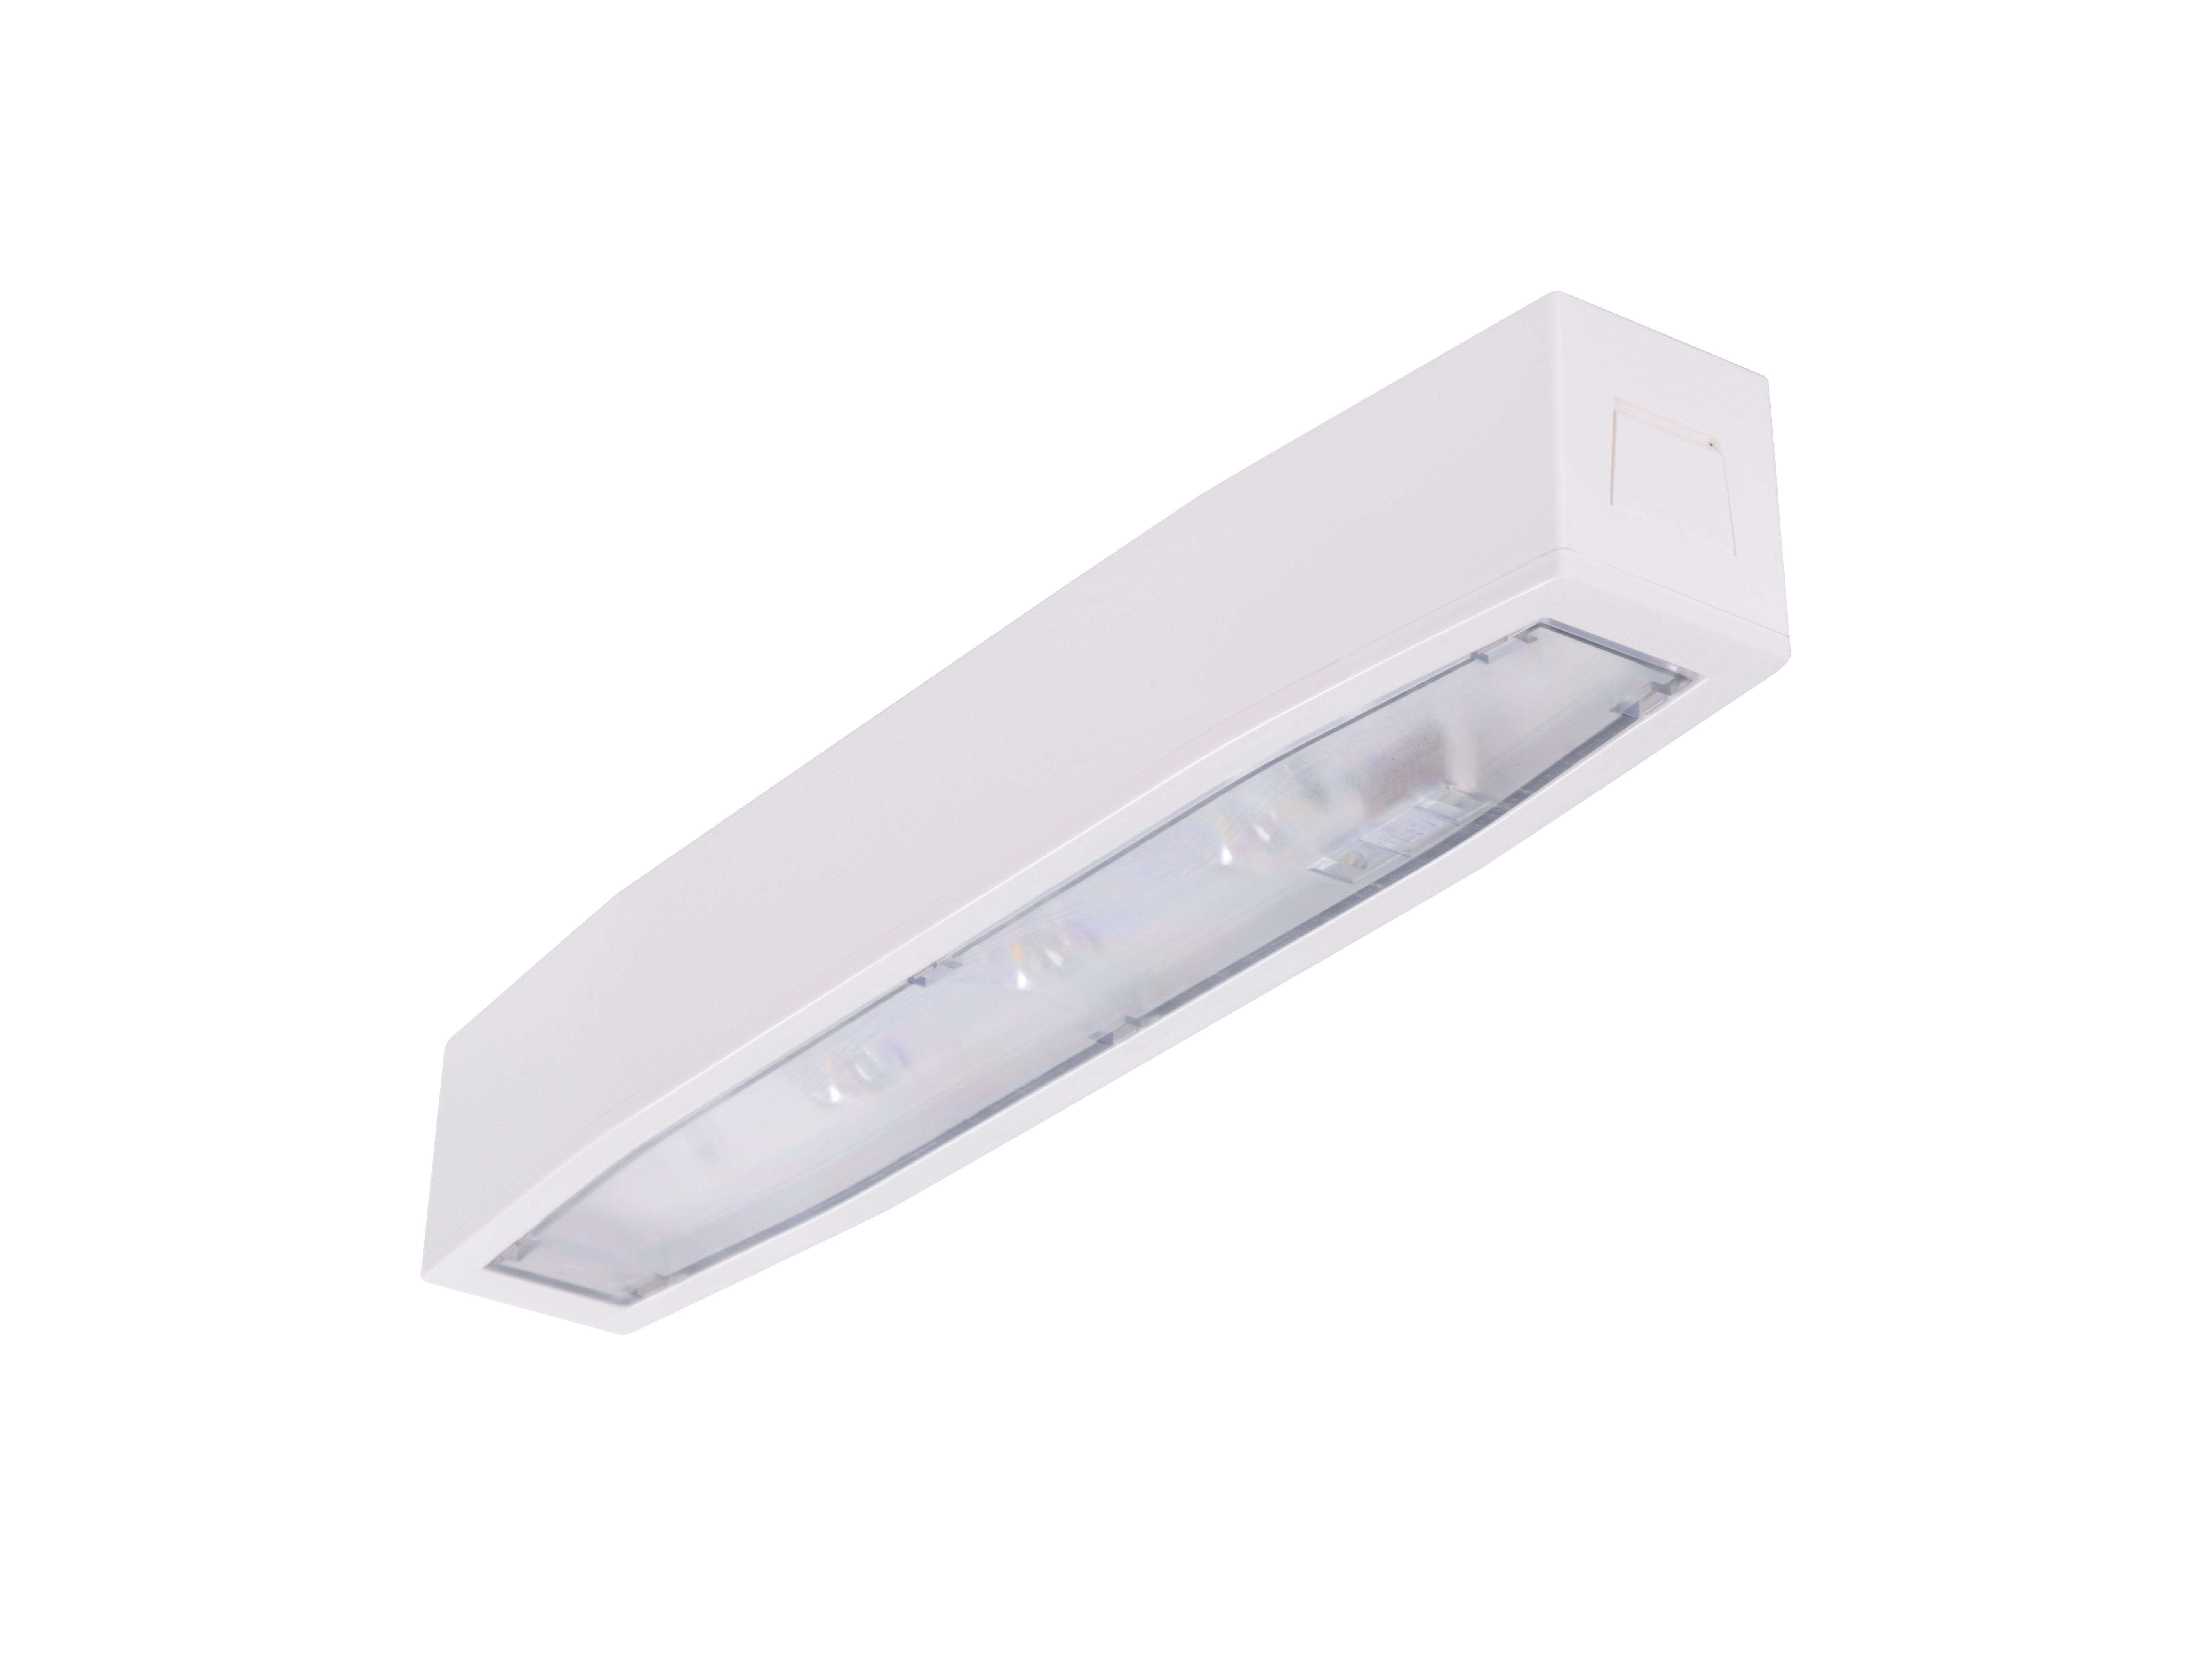 Lampa emergenta led Intelight 94523   3h nementinut test automat0